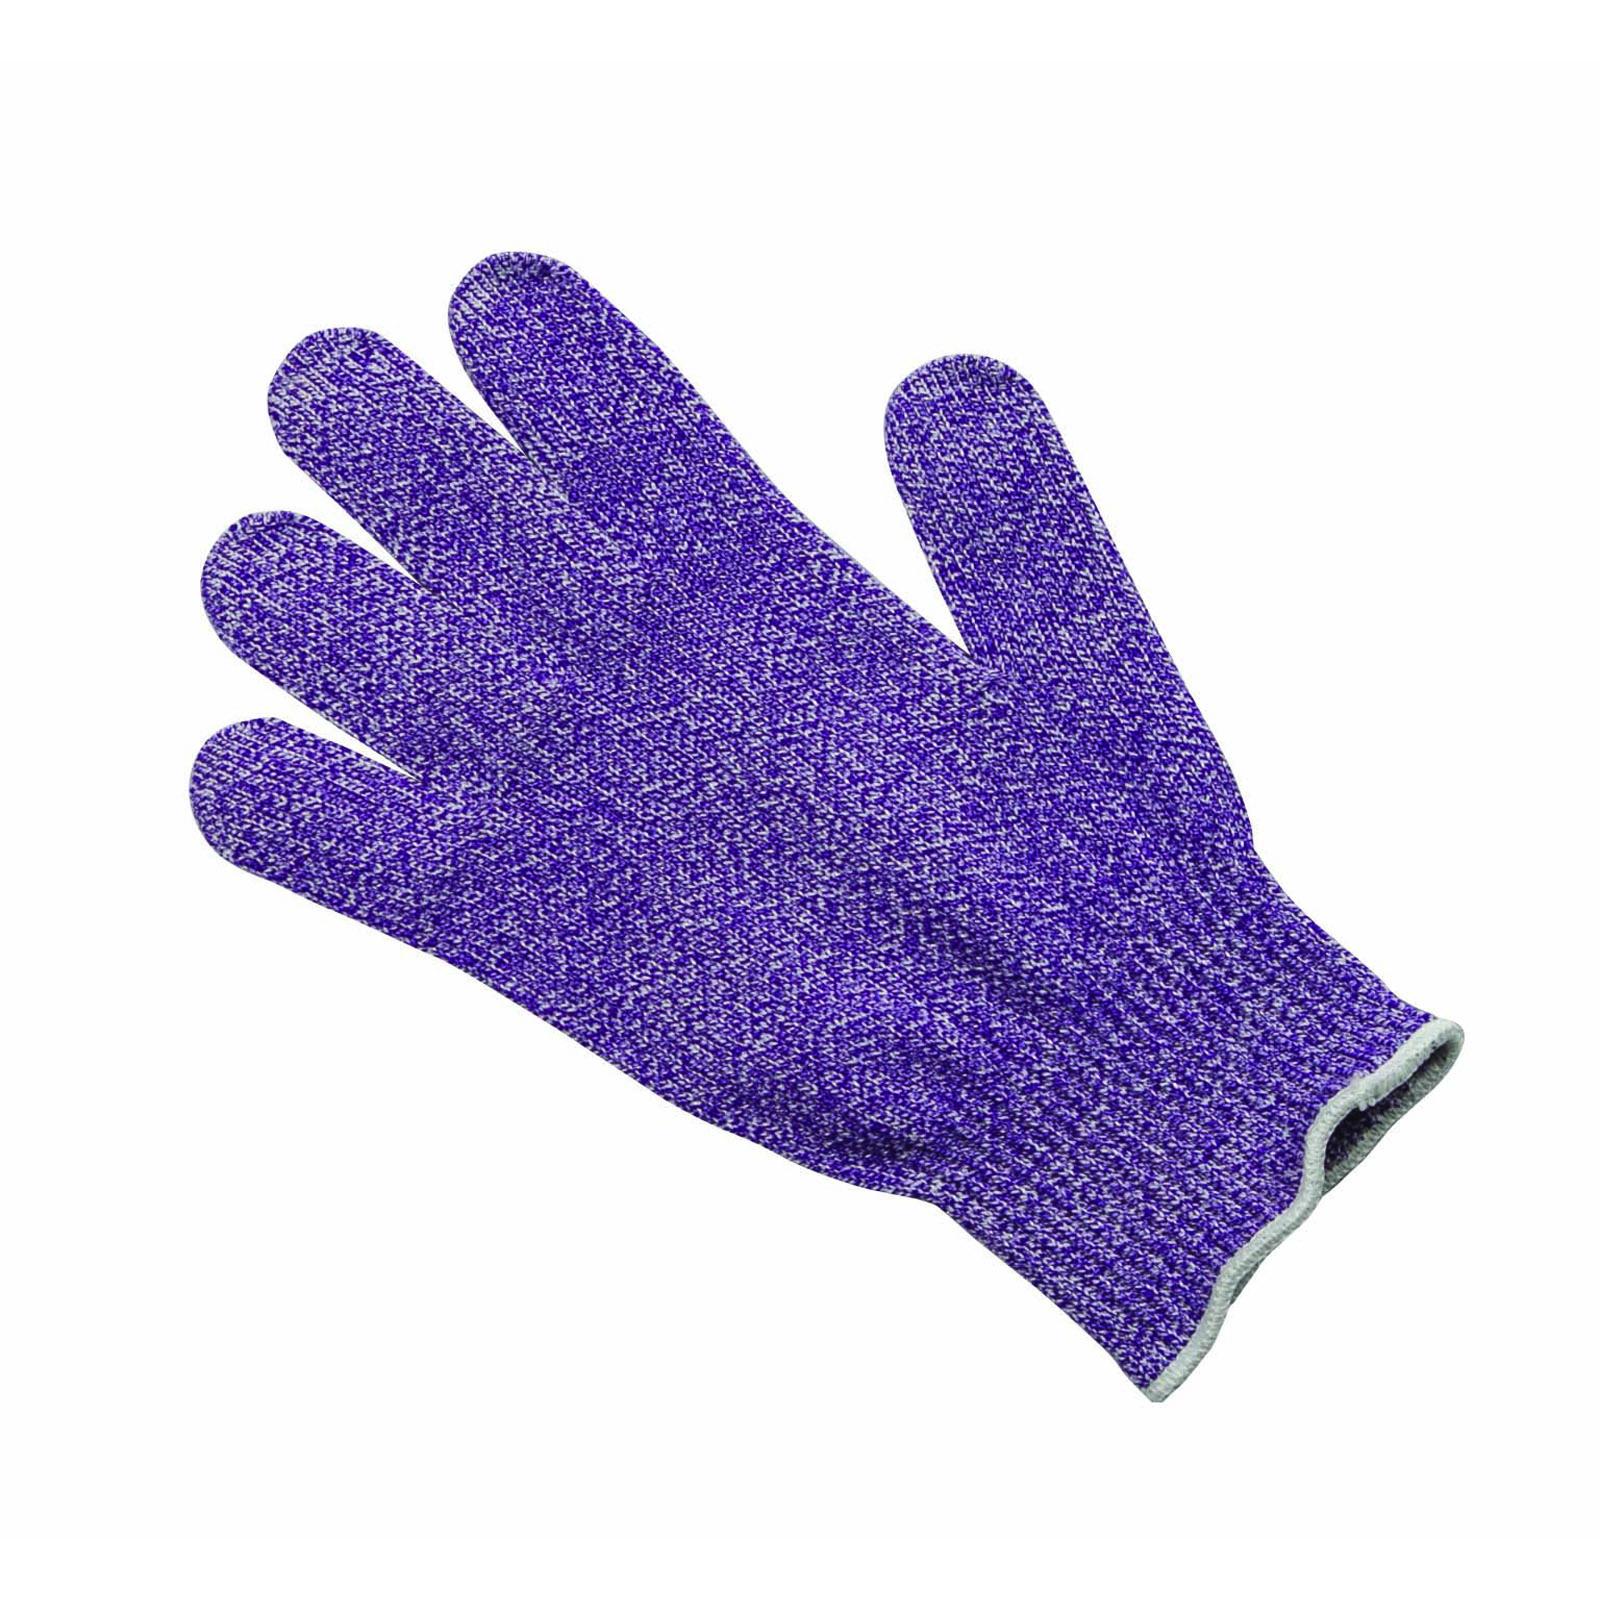 San Jamar SG10-PR-S glove, cut resistant